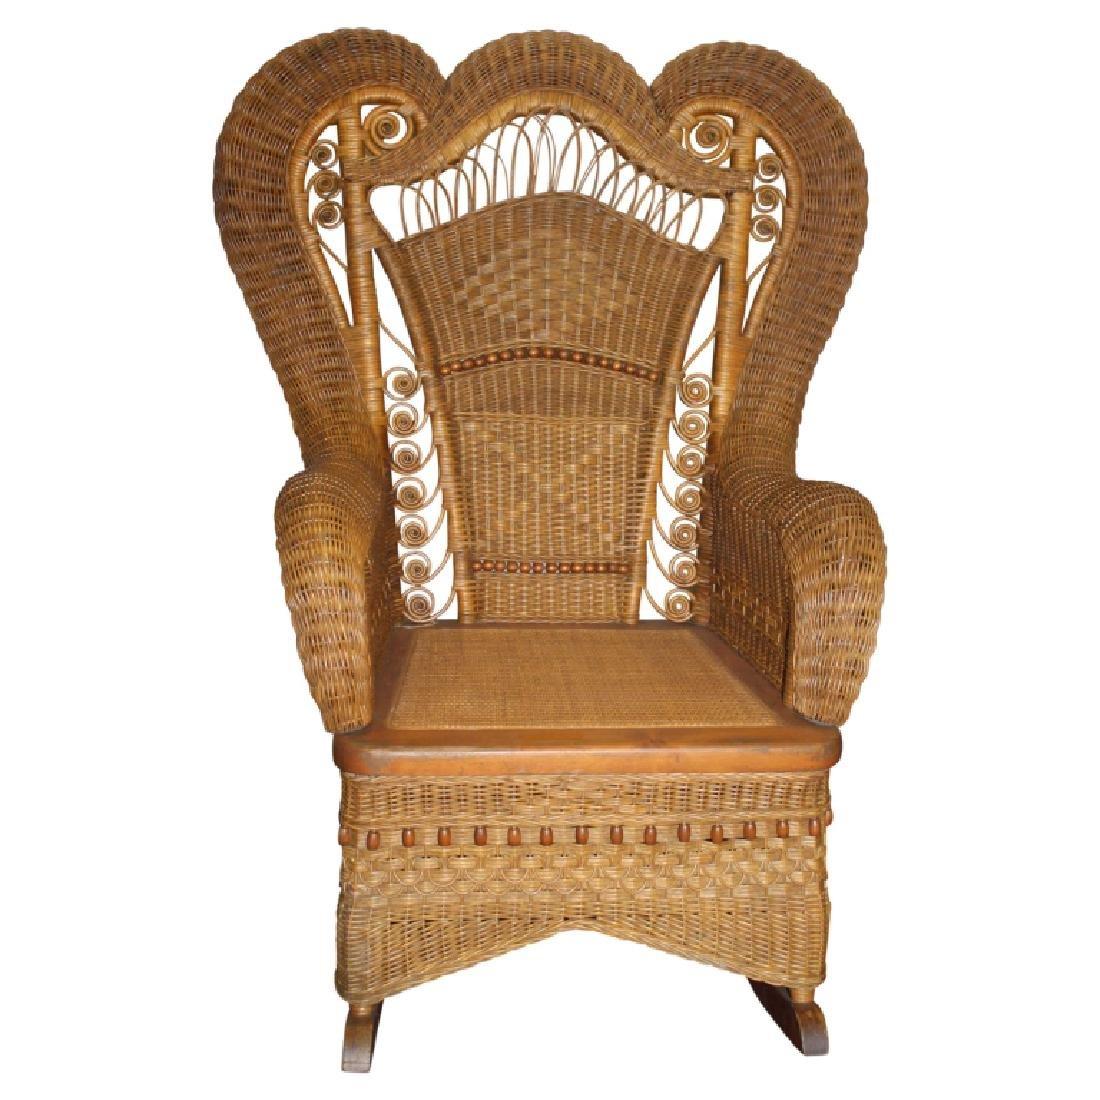 Heywood Wakefield Wicker Style Rocking Chair